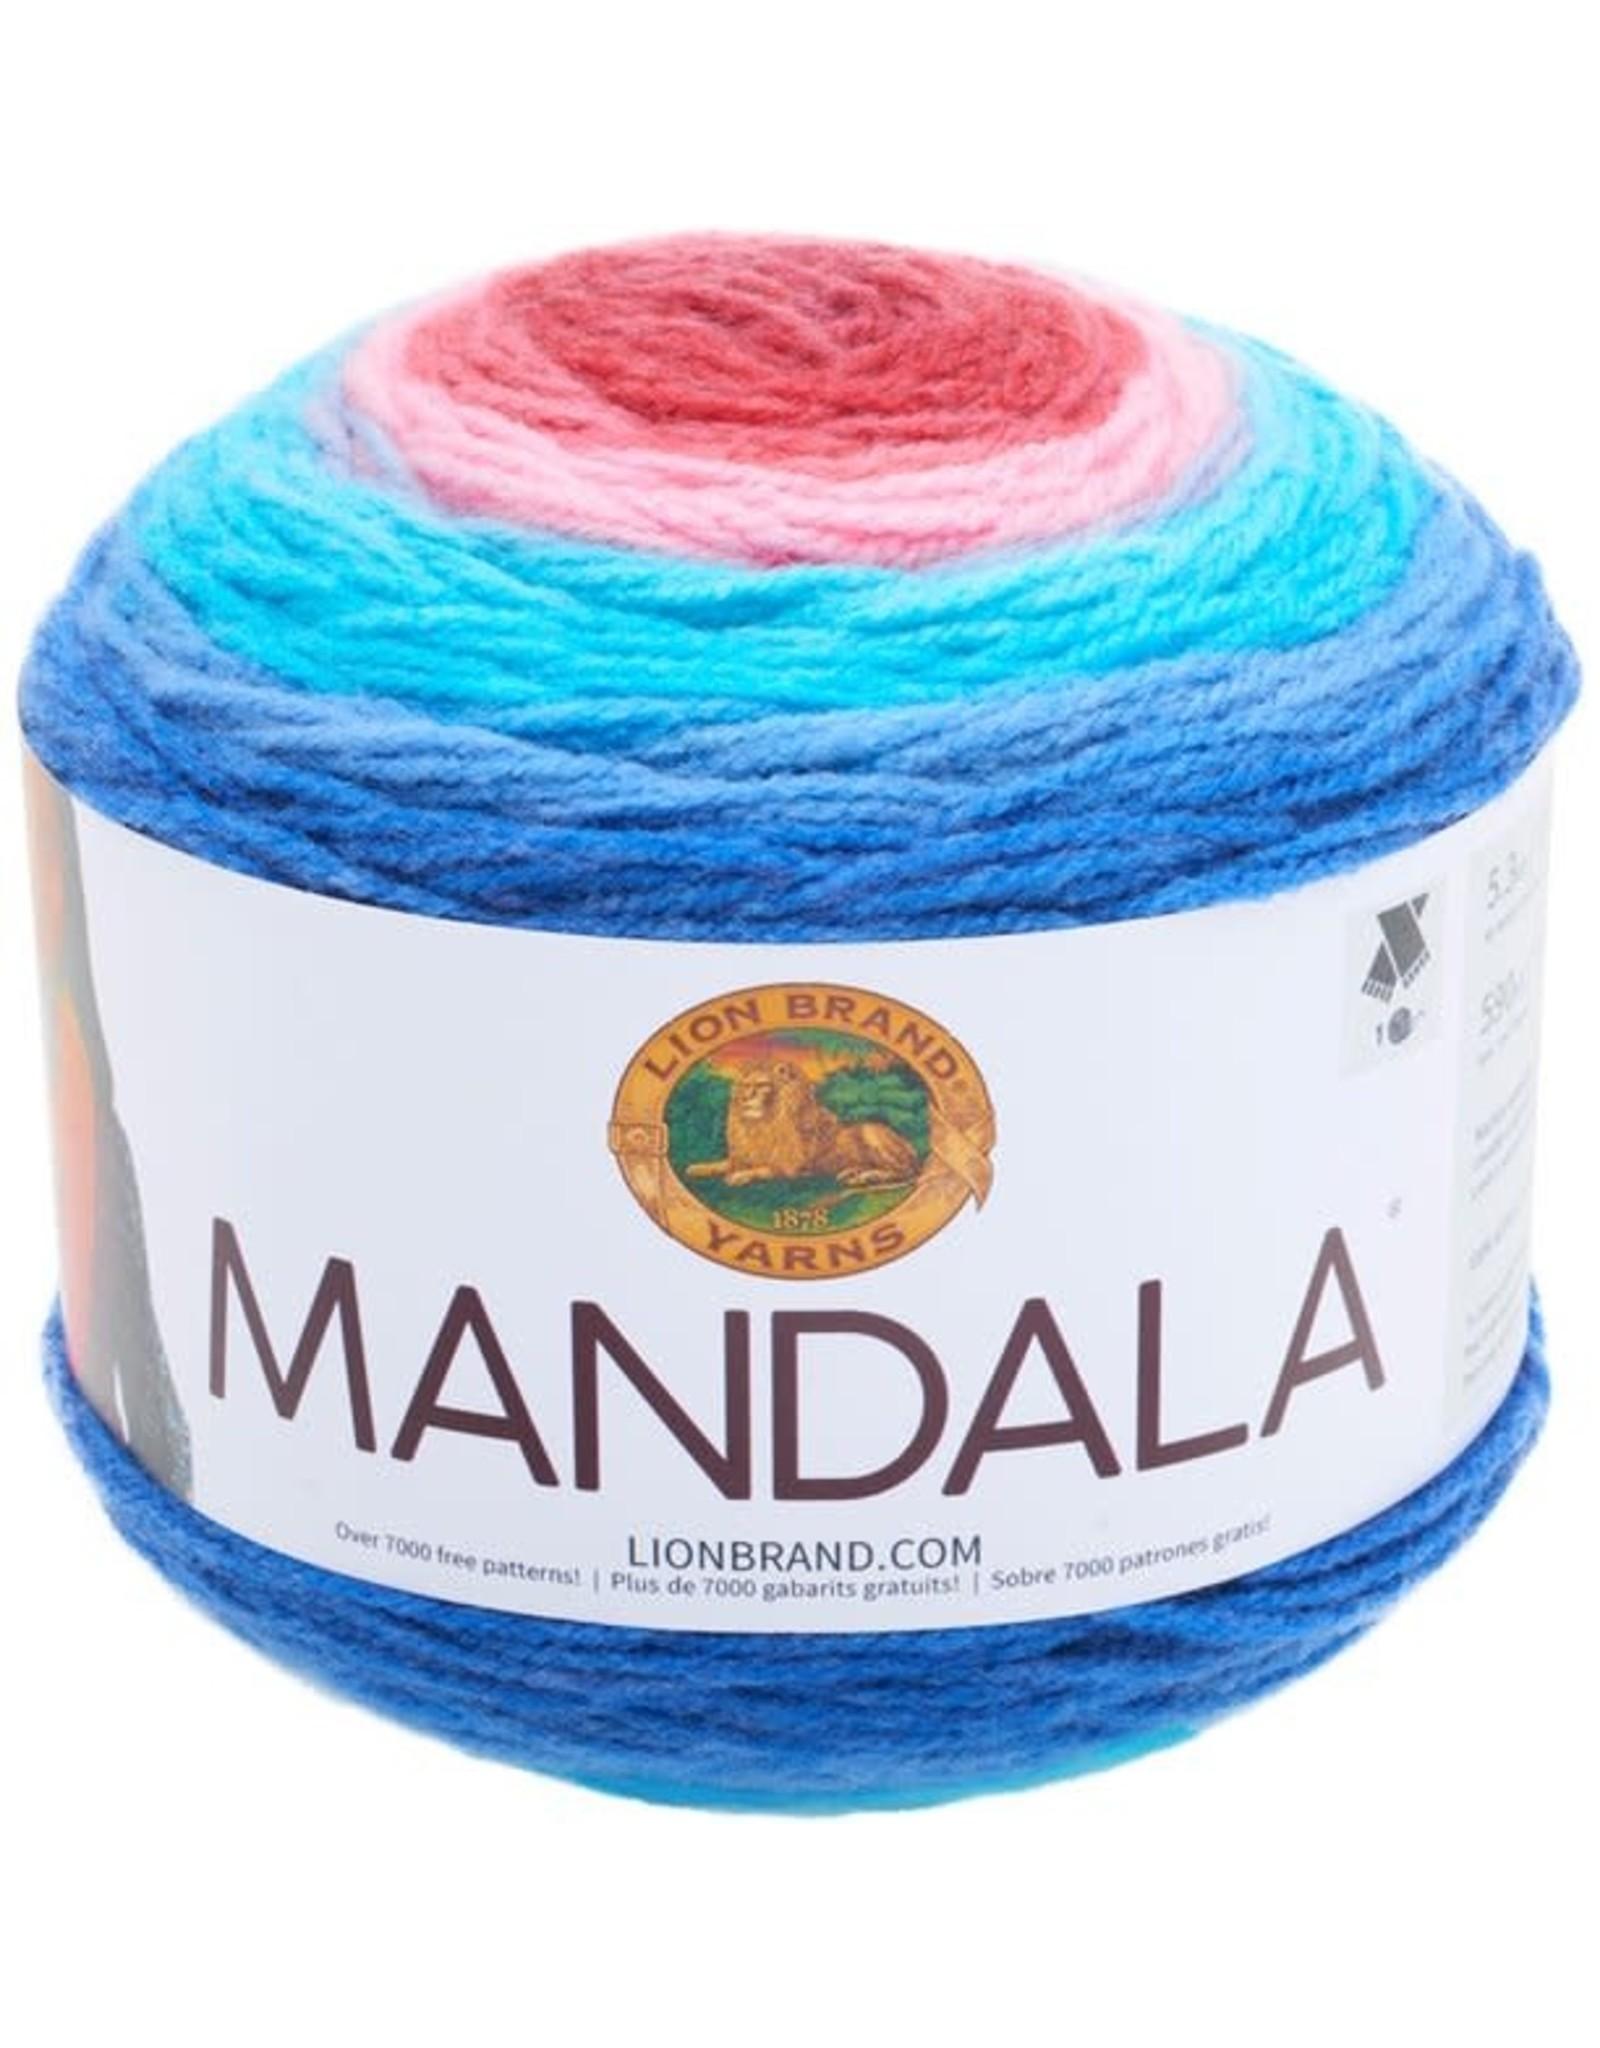 Phoenix - Mandala - Lion Brand